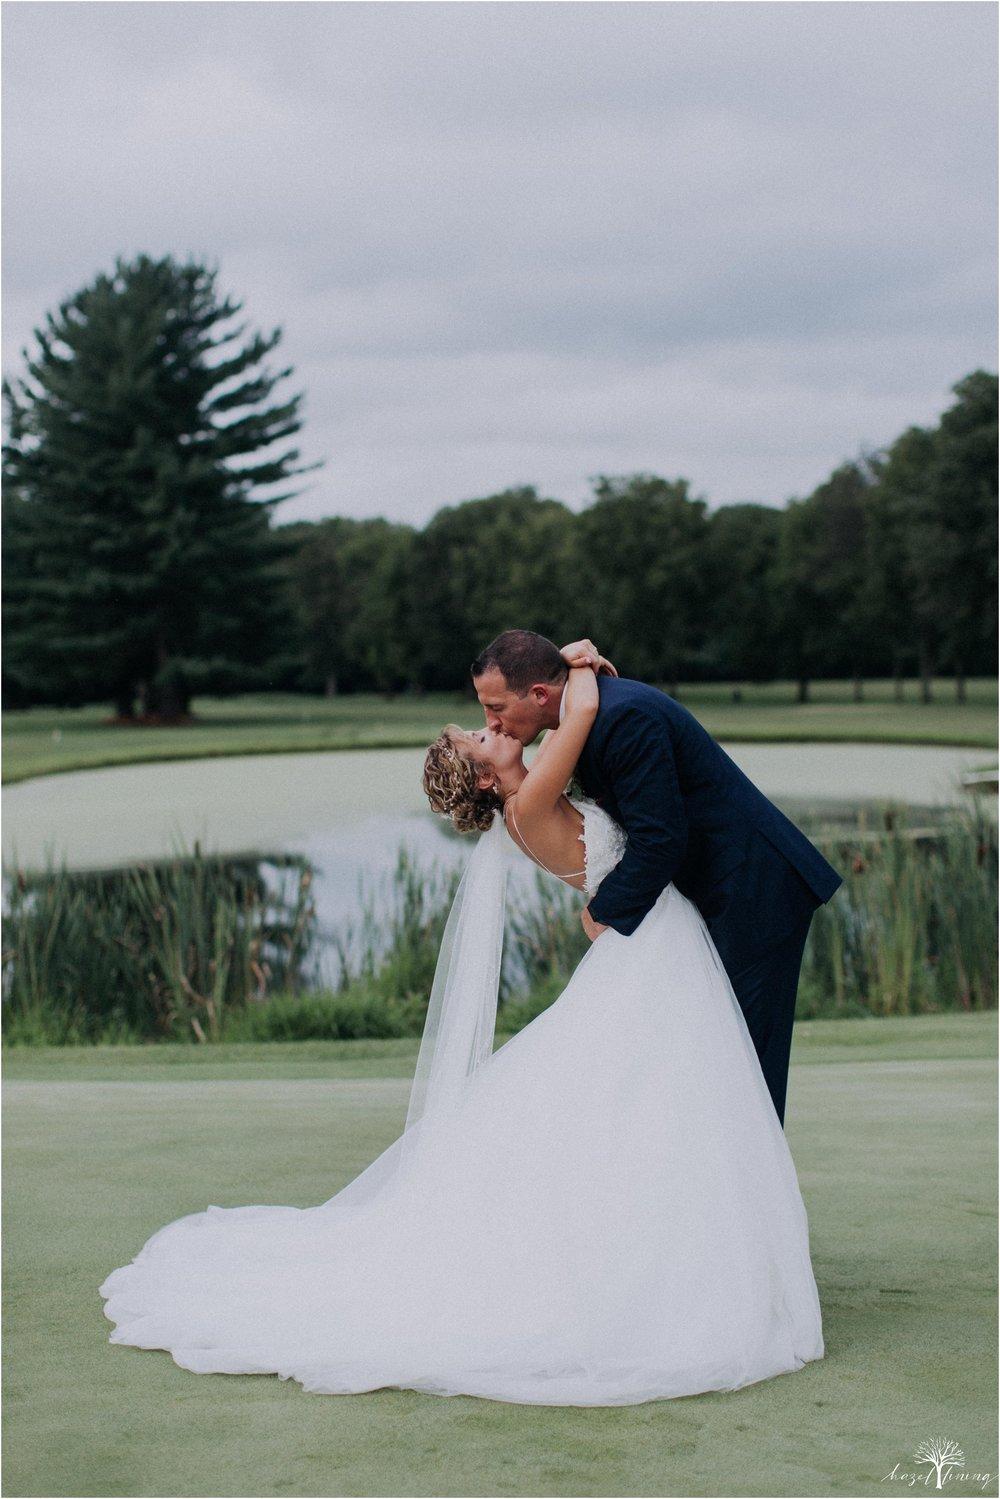 jonathan-weibel-becky-haywood-loft-at-sweetwater-cc-pennsburg-pennsylvania-rainy-day-summer-wedding-hazel-lining-travel-wedding-elopement-photography_0090.jpg